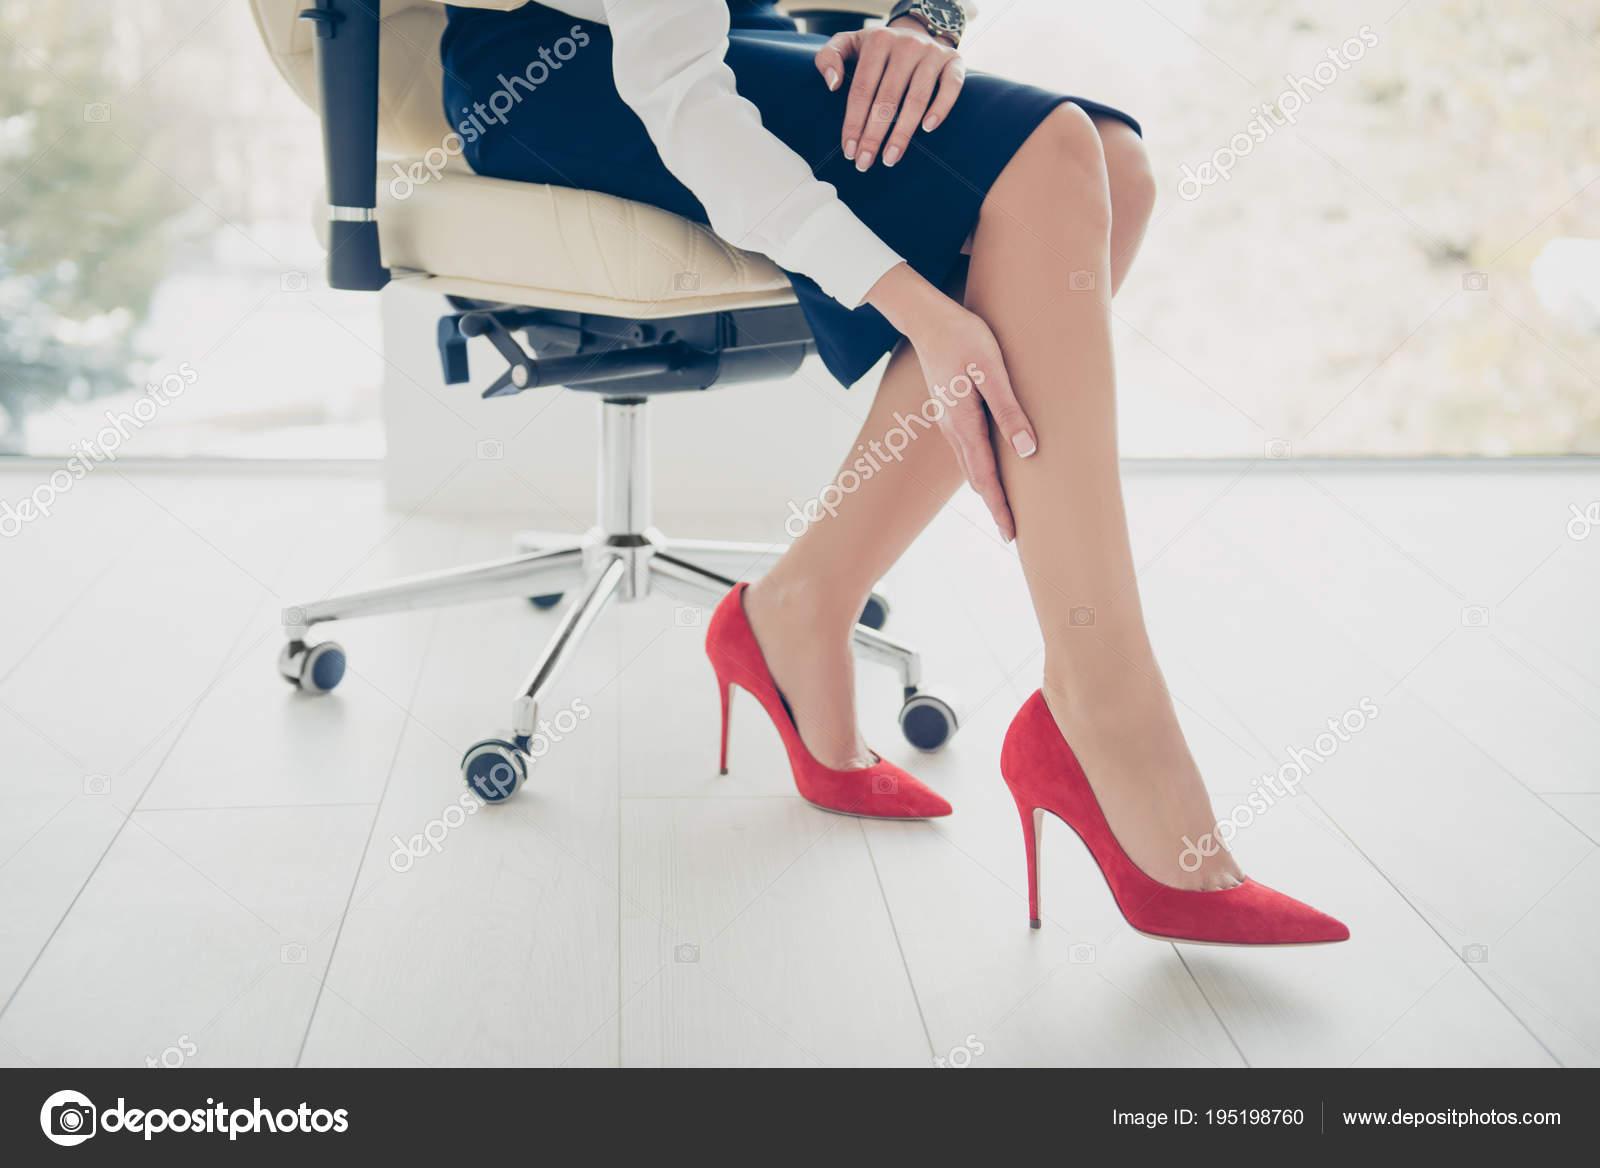 Фото под юбки снизу, негры затрахали телку до супер оргазма